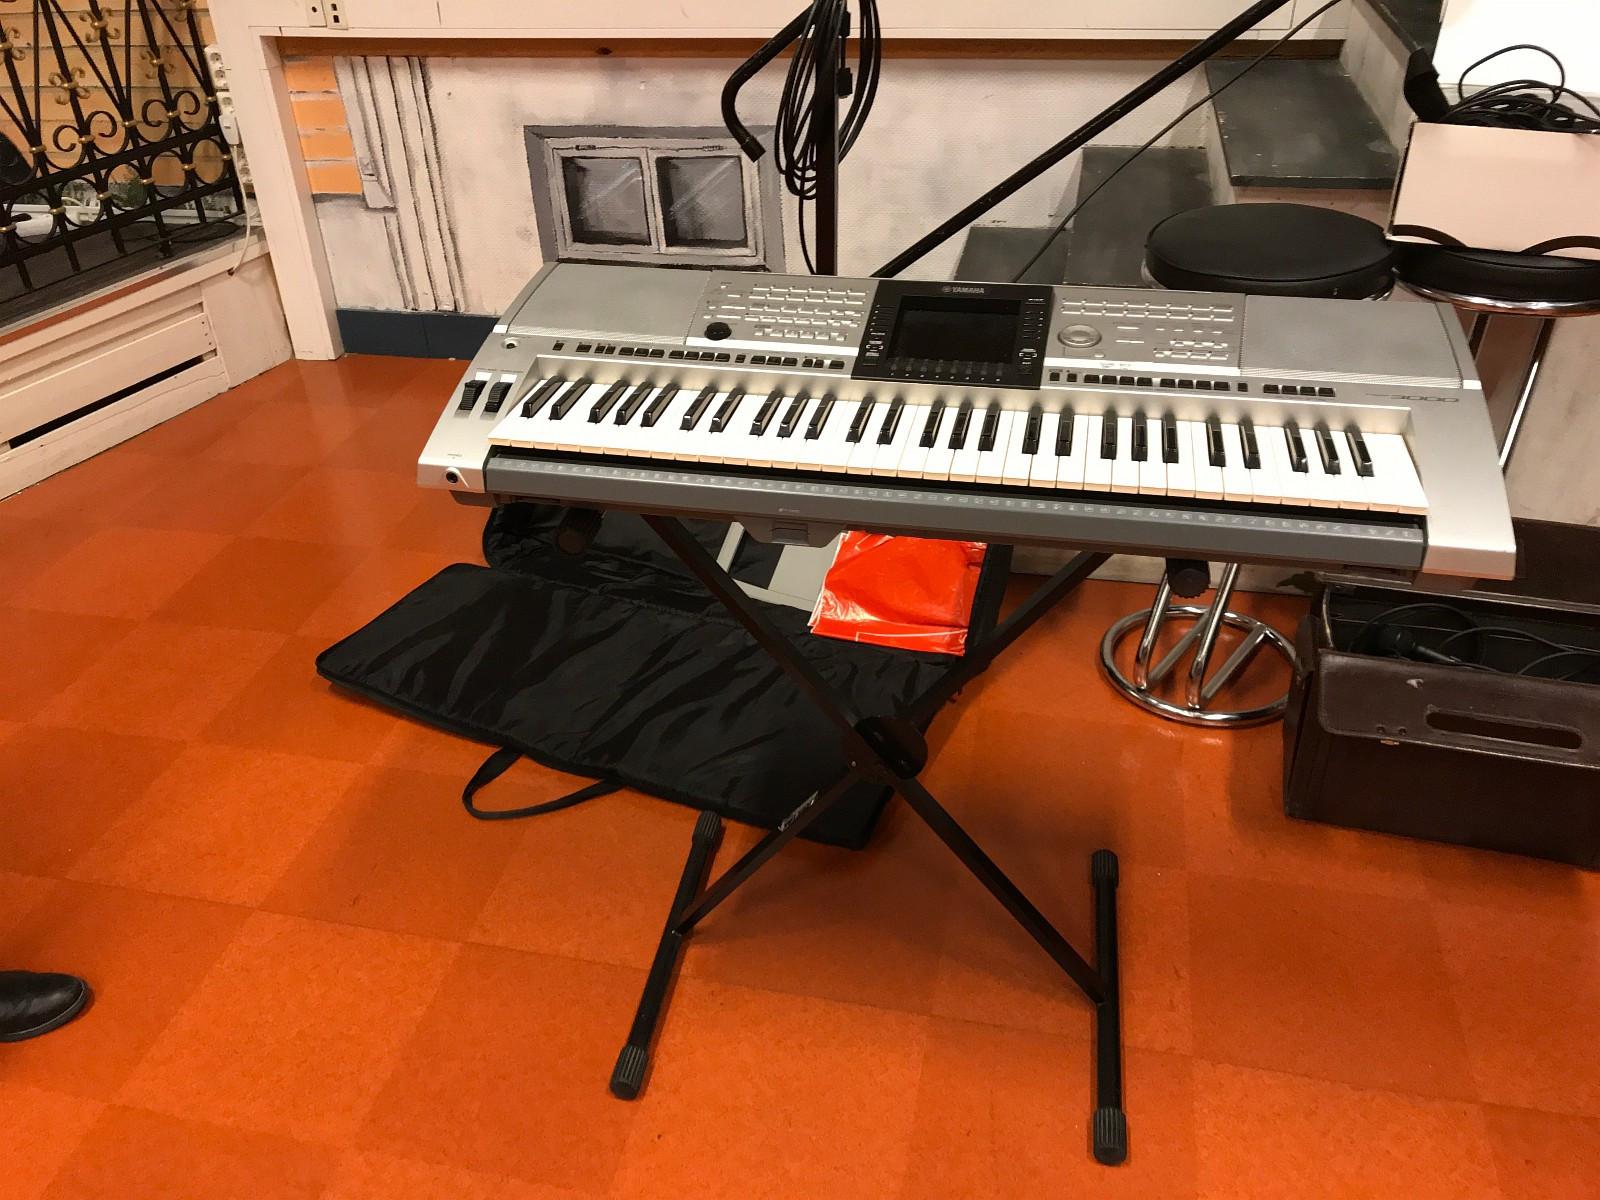 Keyboard med tilbehør - Tertnes  - Keyboard m/stativ kr. 5000,- 2 stk høytalere kr. 2000,- Forsterker kr. 2000,- Miksepult kr. 1000,- Kasse til keyboard kr. 3000,- - Tertnes